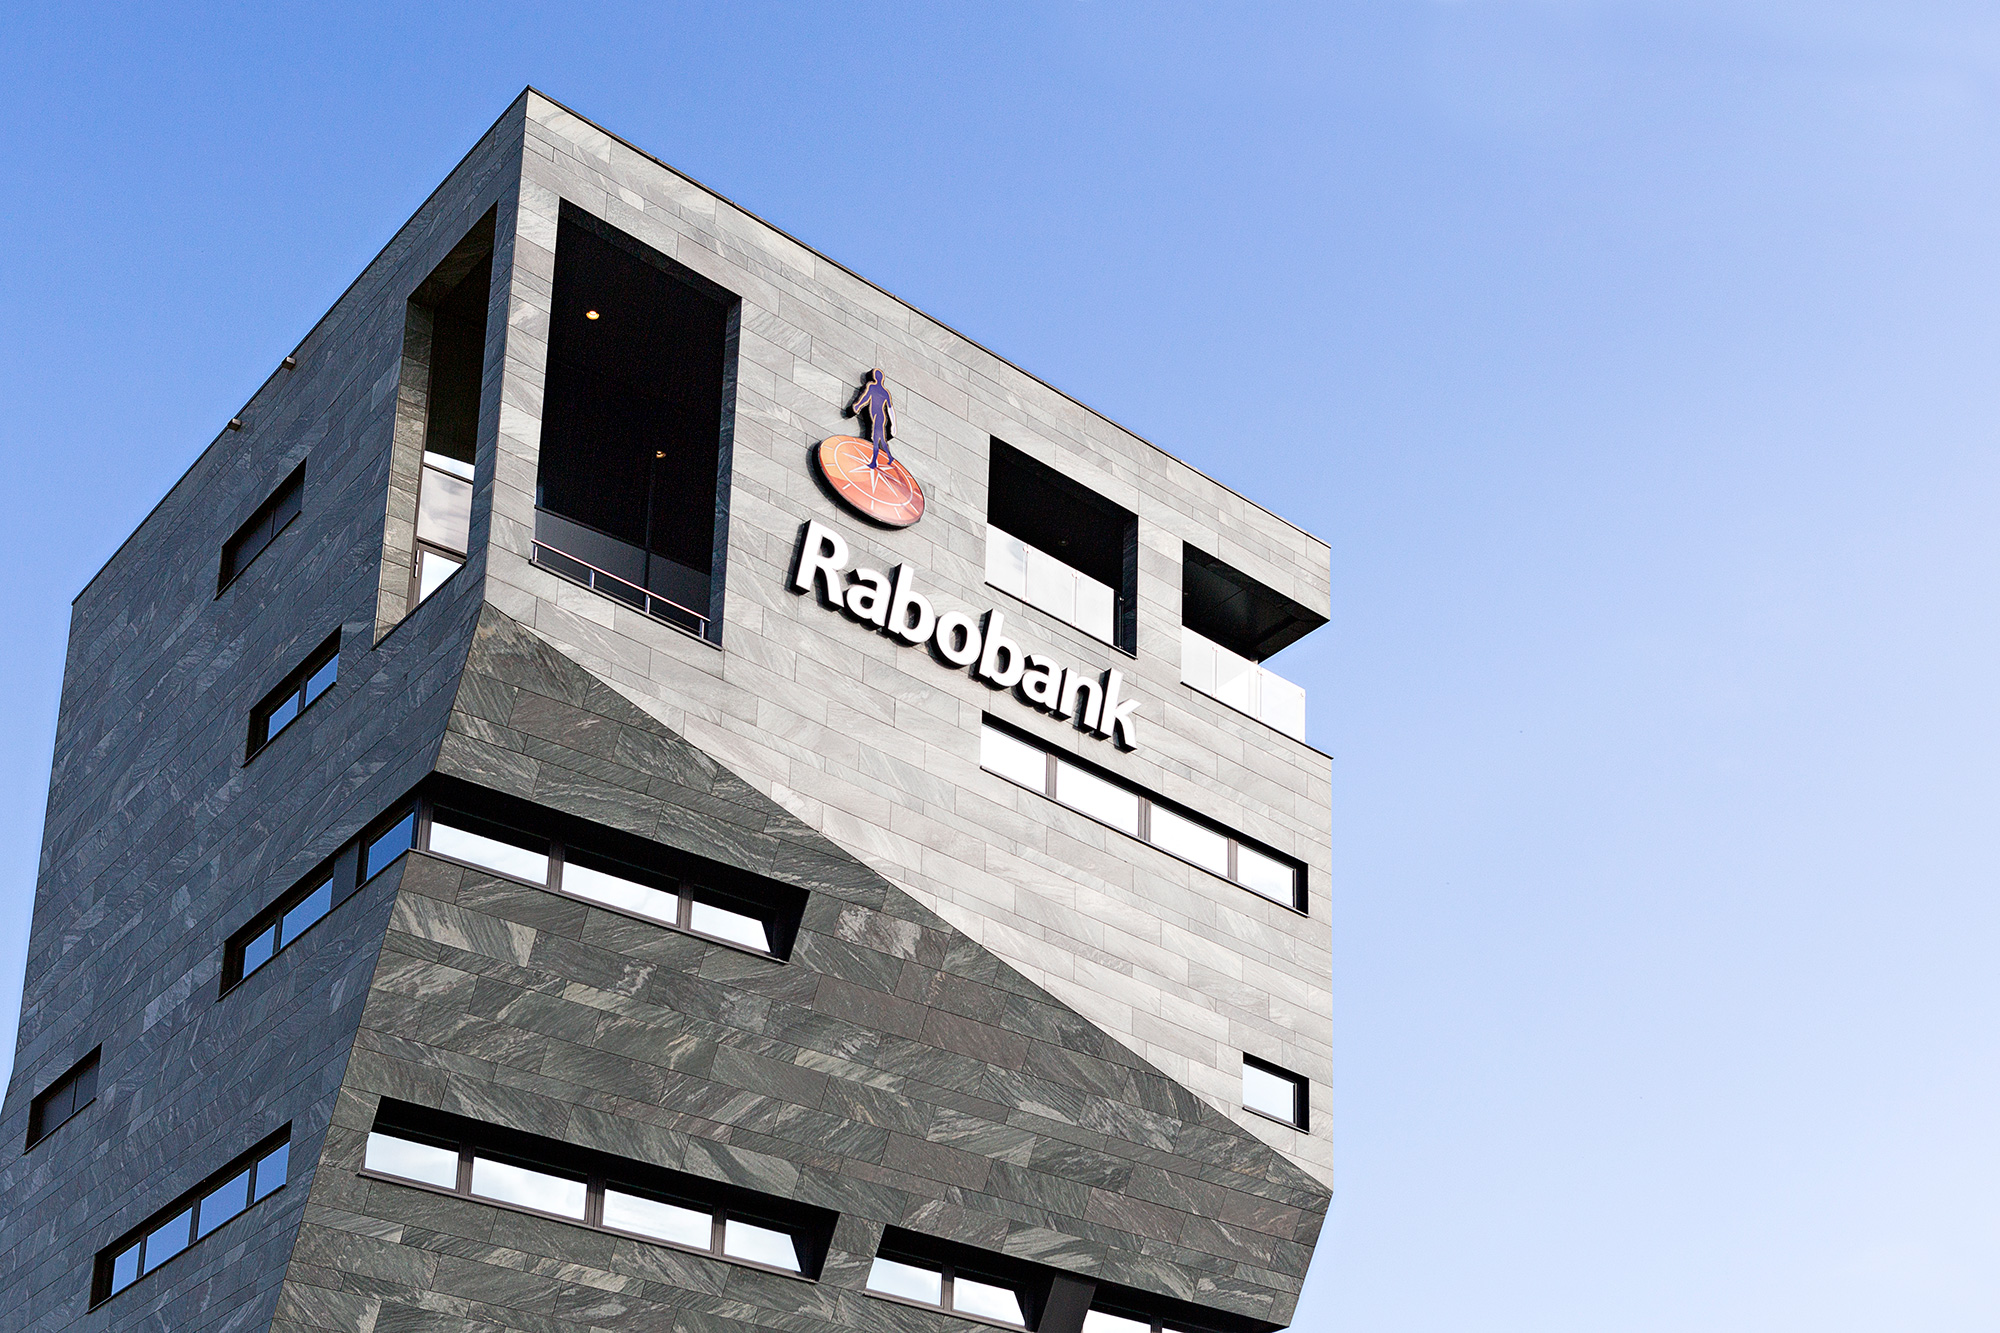 Rabobank Roermond